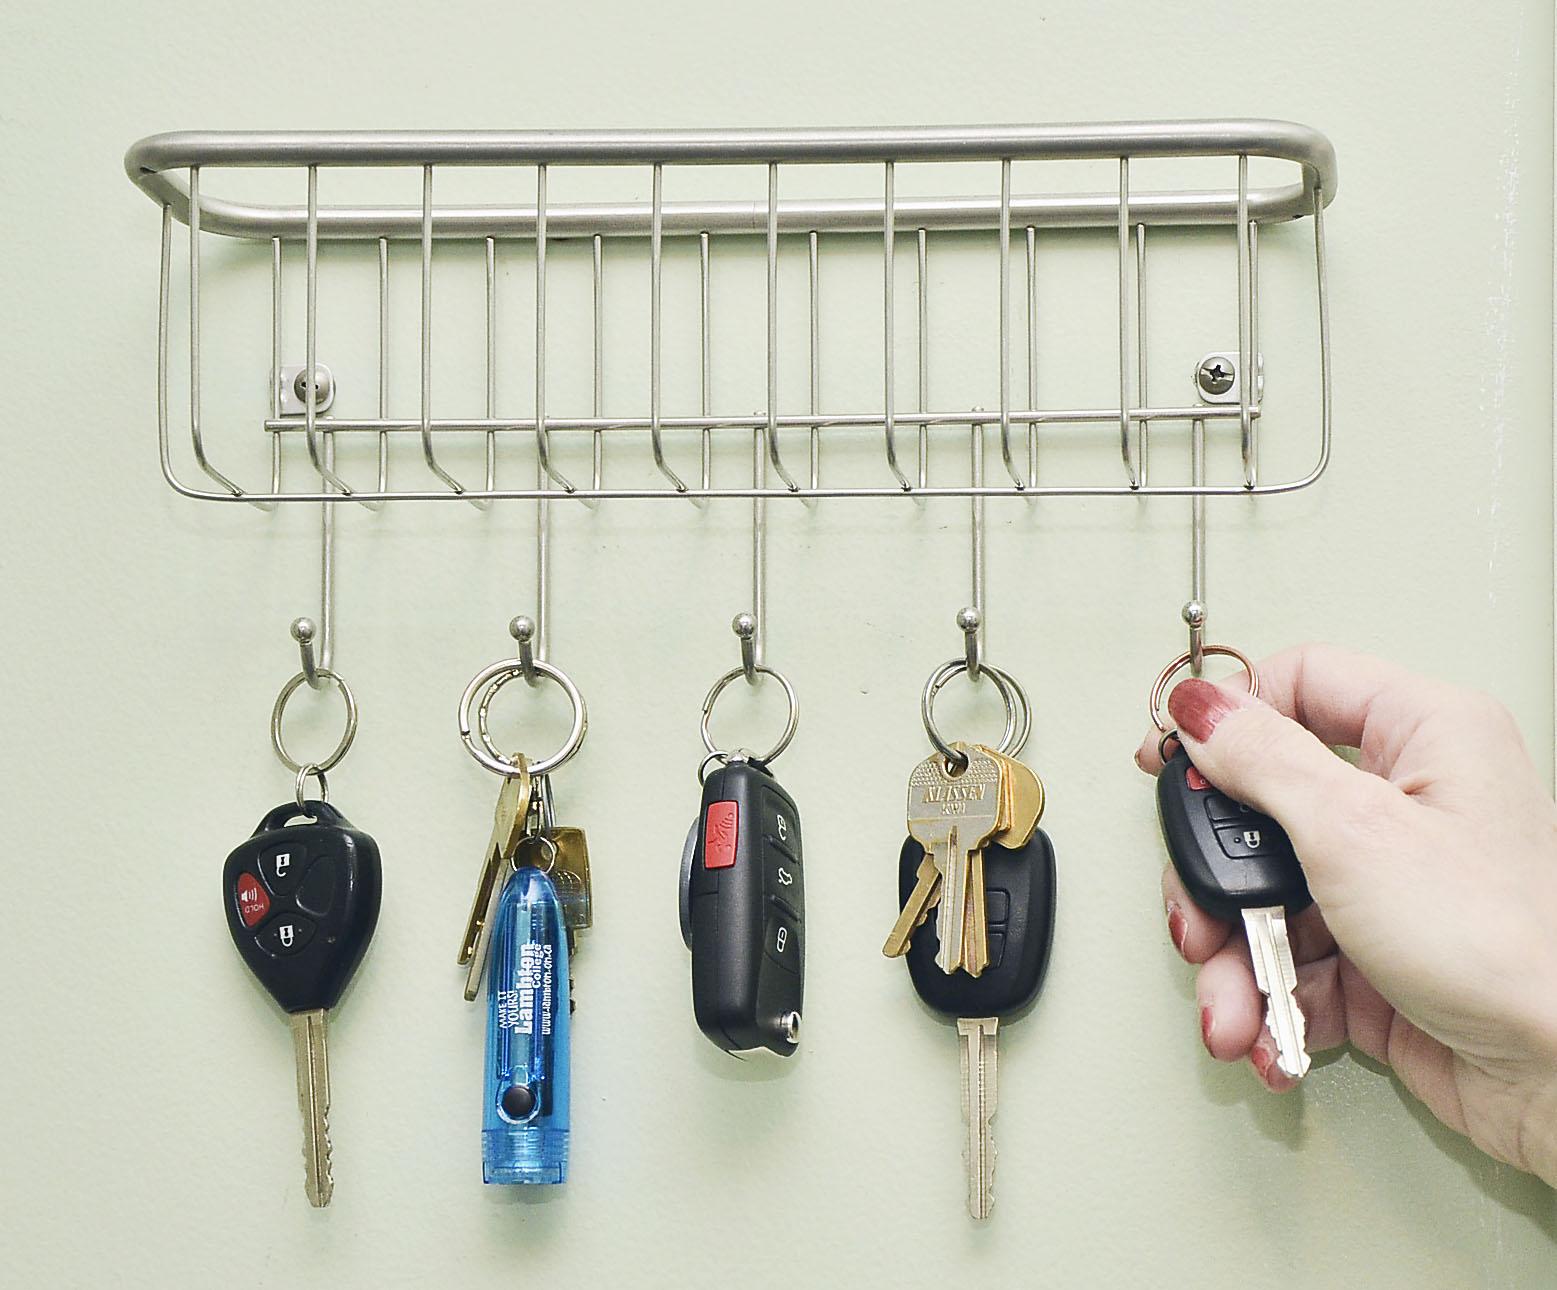 Hang keys by the entrance door